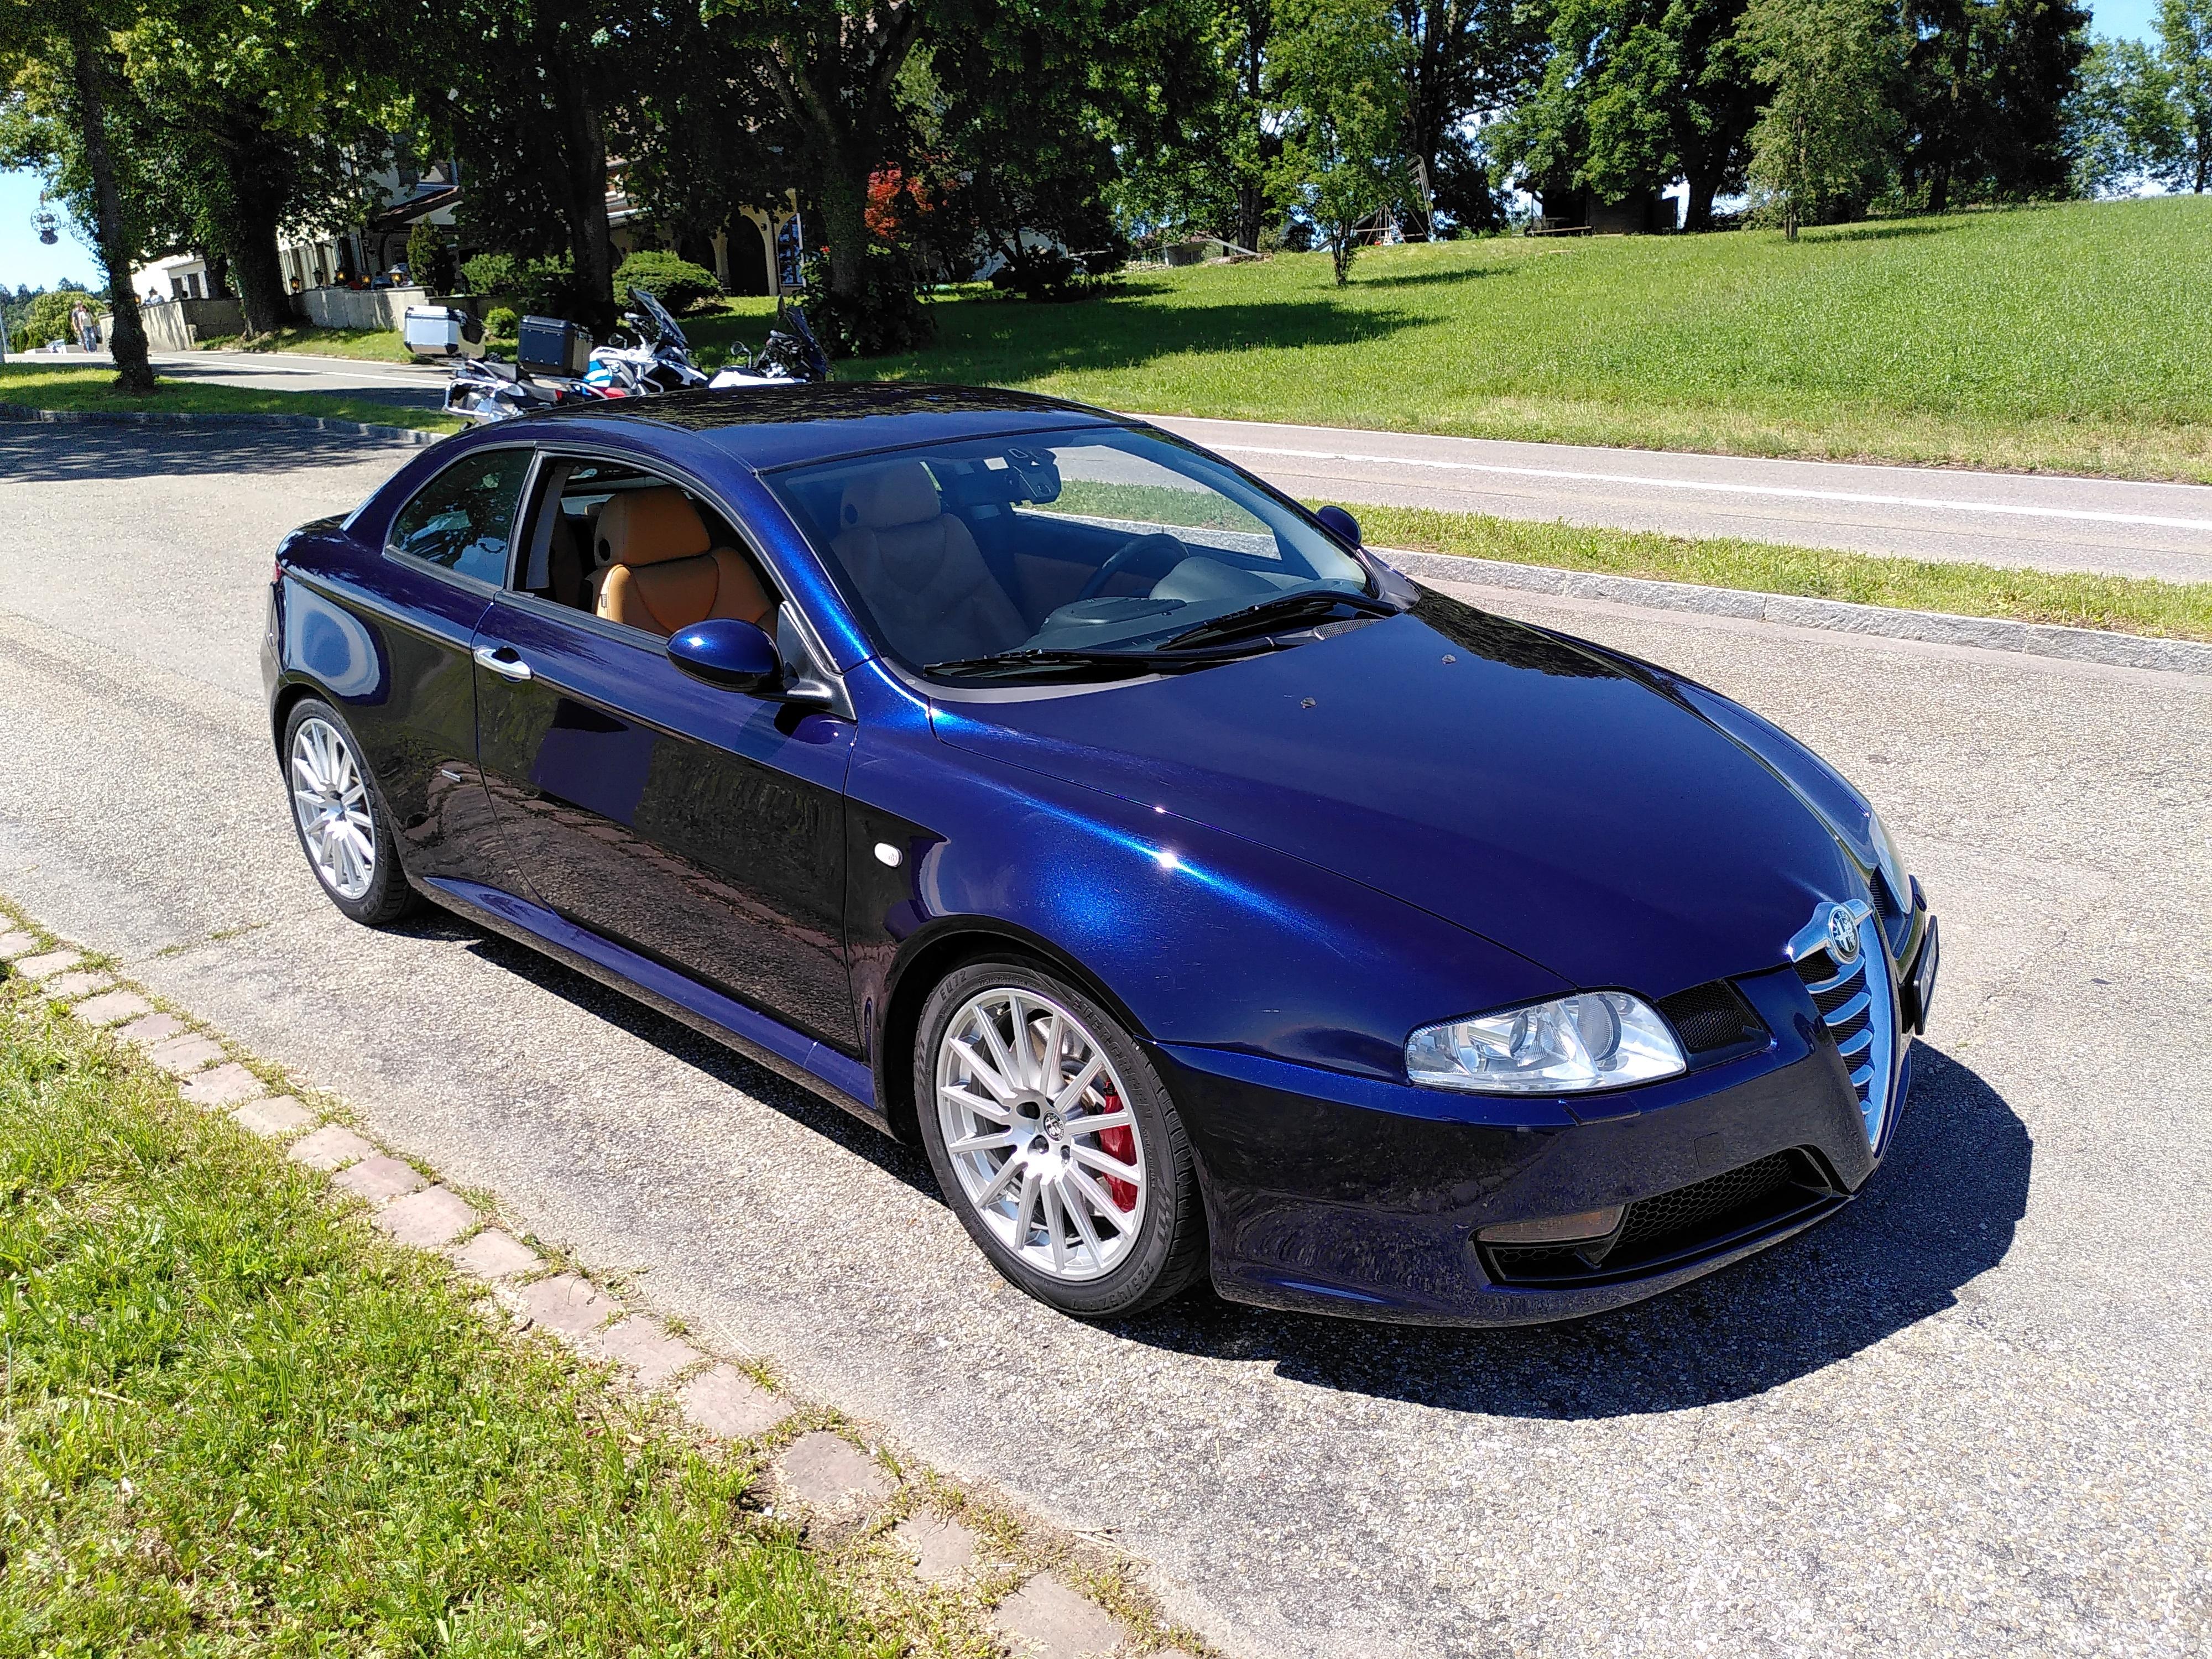 Buy Used Car Coupe Alfa Romeo Gt 3 2 V6 24v Distinctive 174000 Km At 10500 Chf On Carforyou Ch